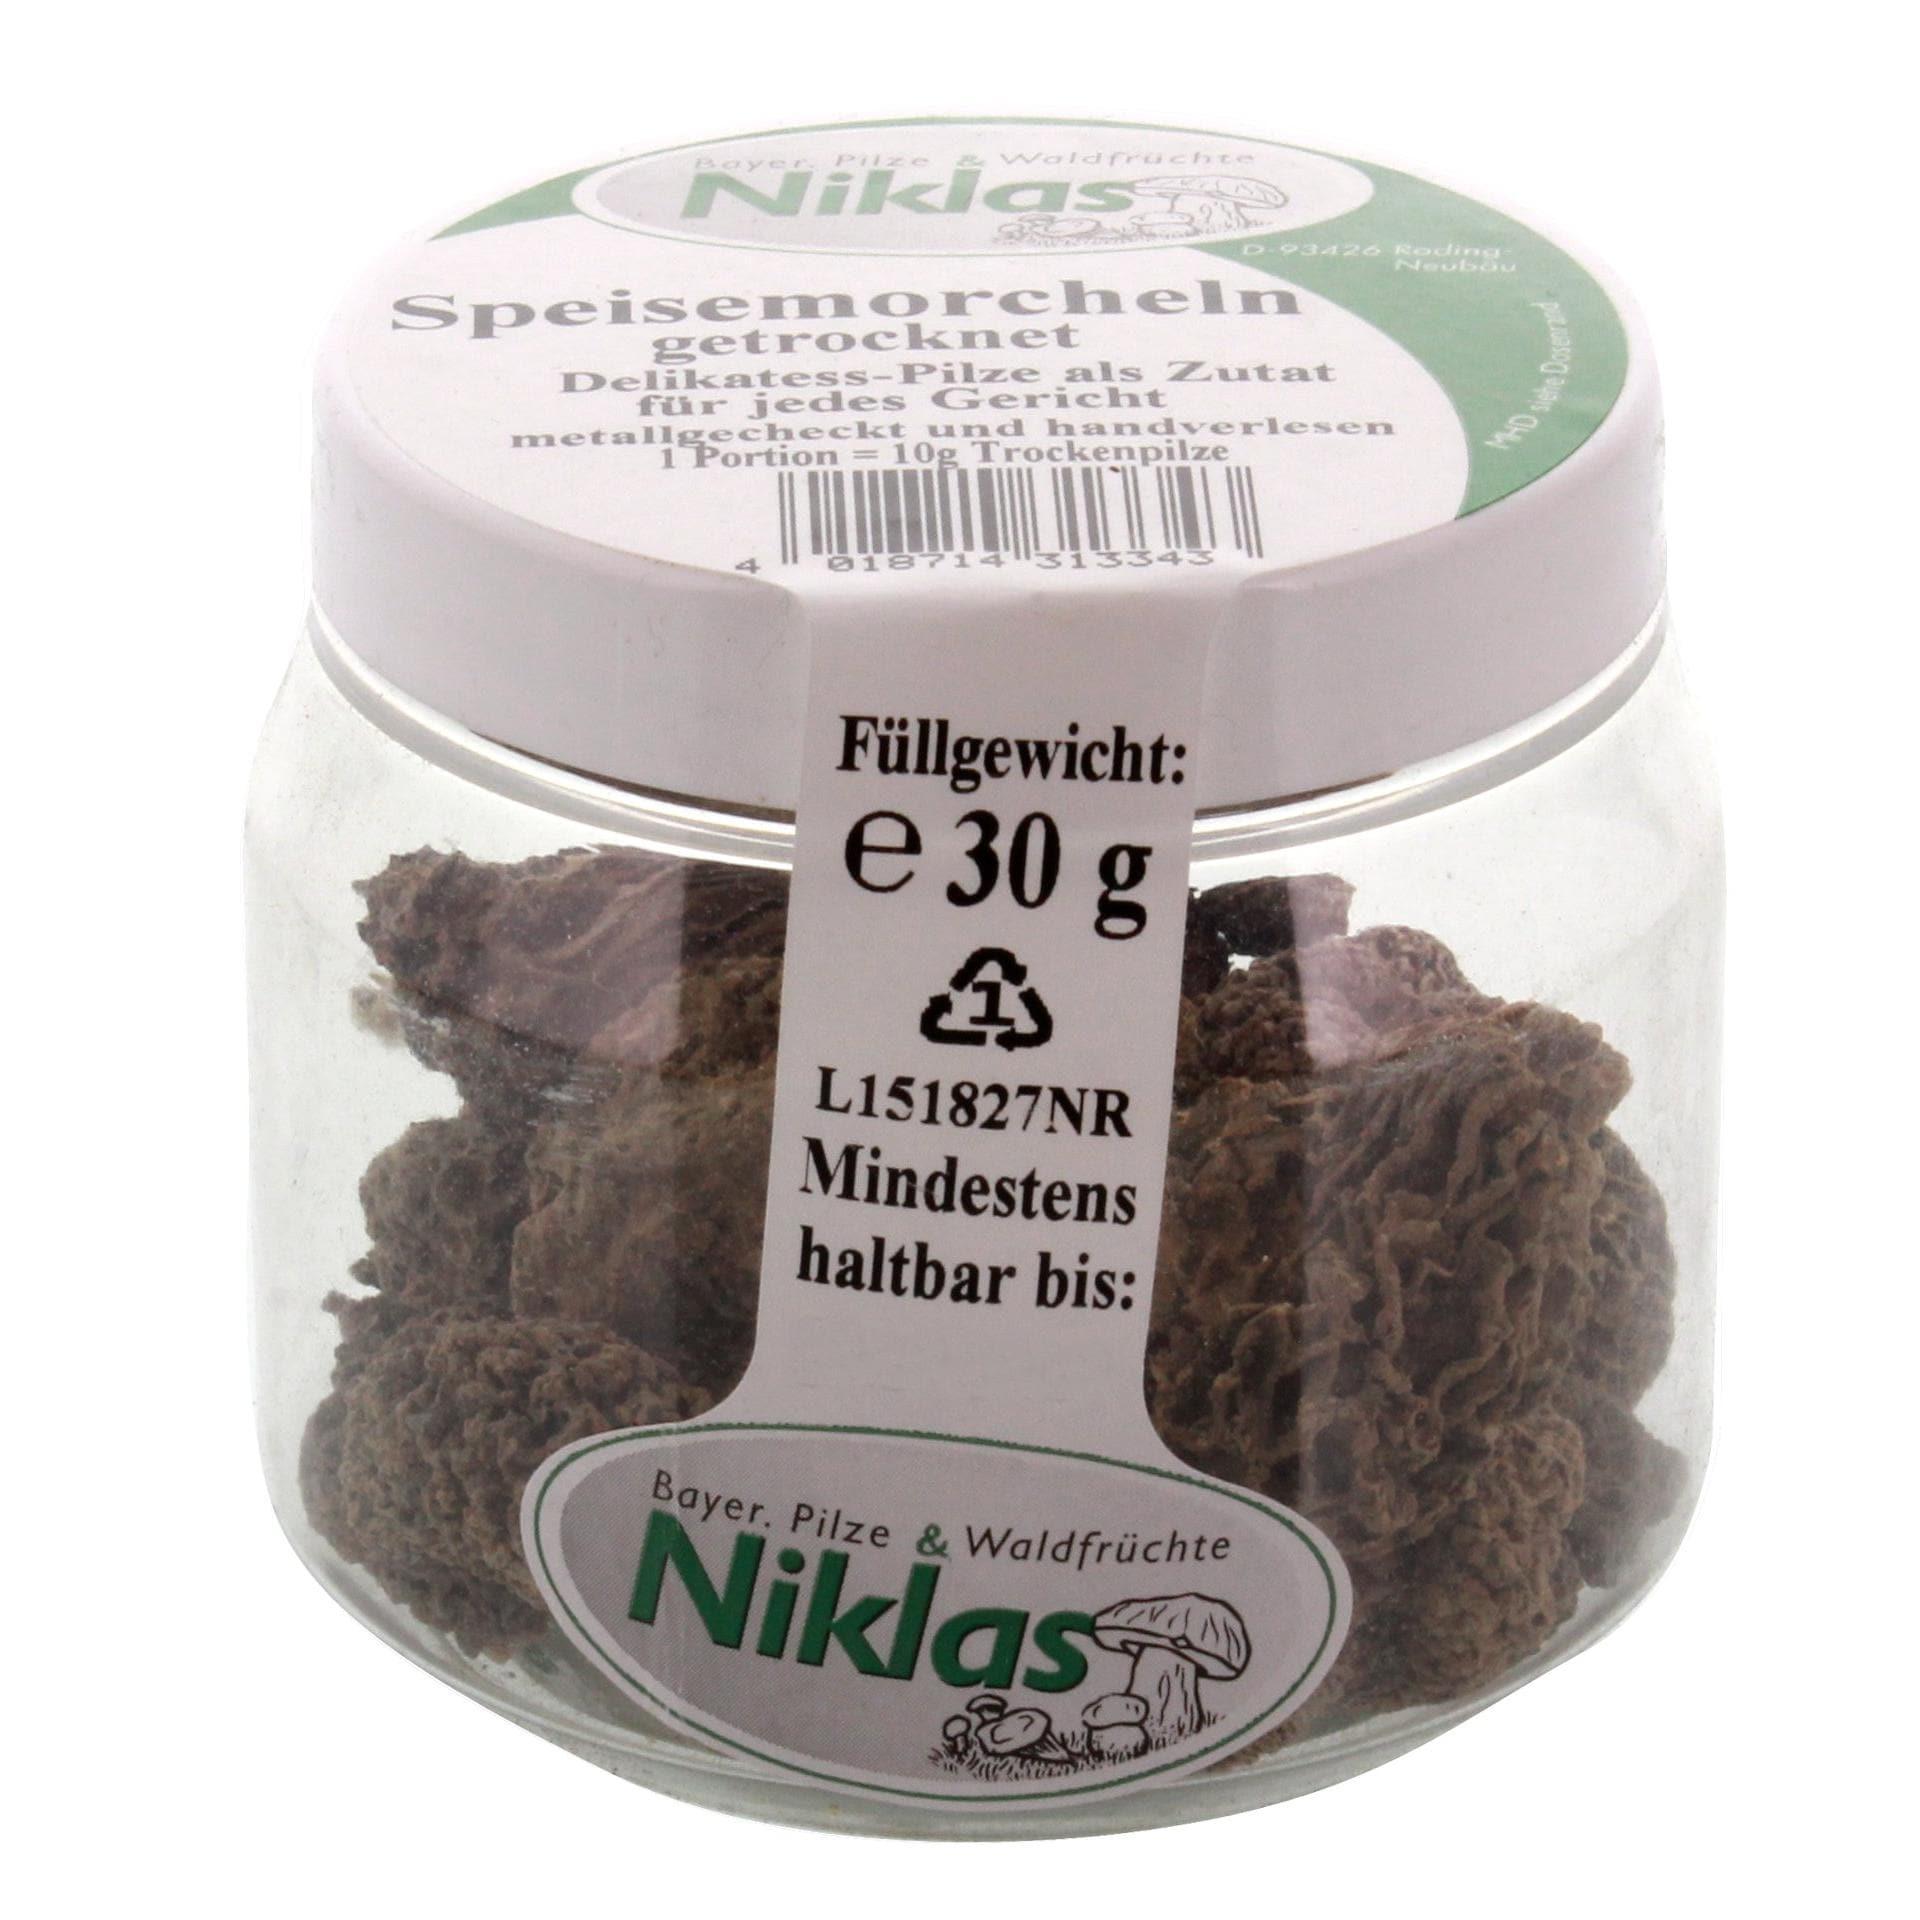 Niklas - Speisemorcheln getrocknet - 30g